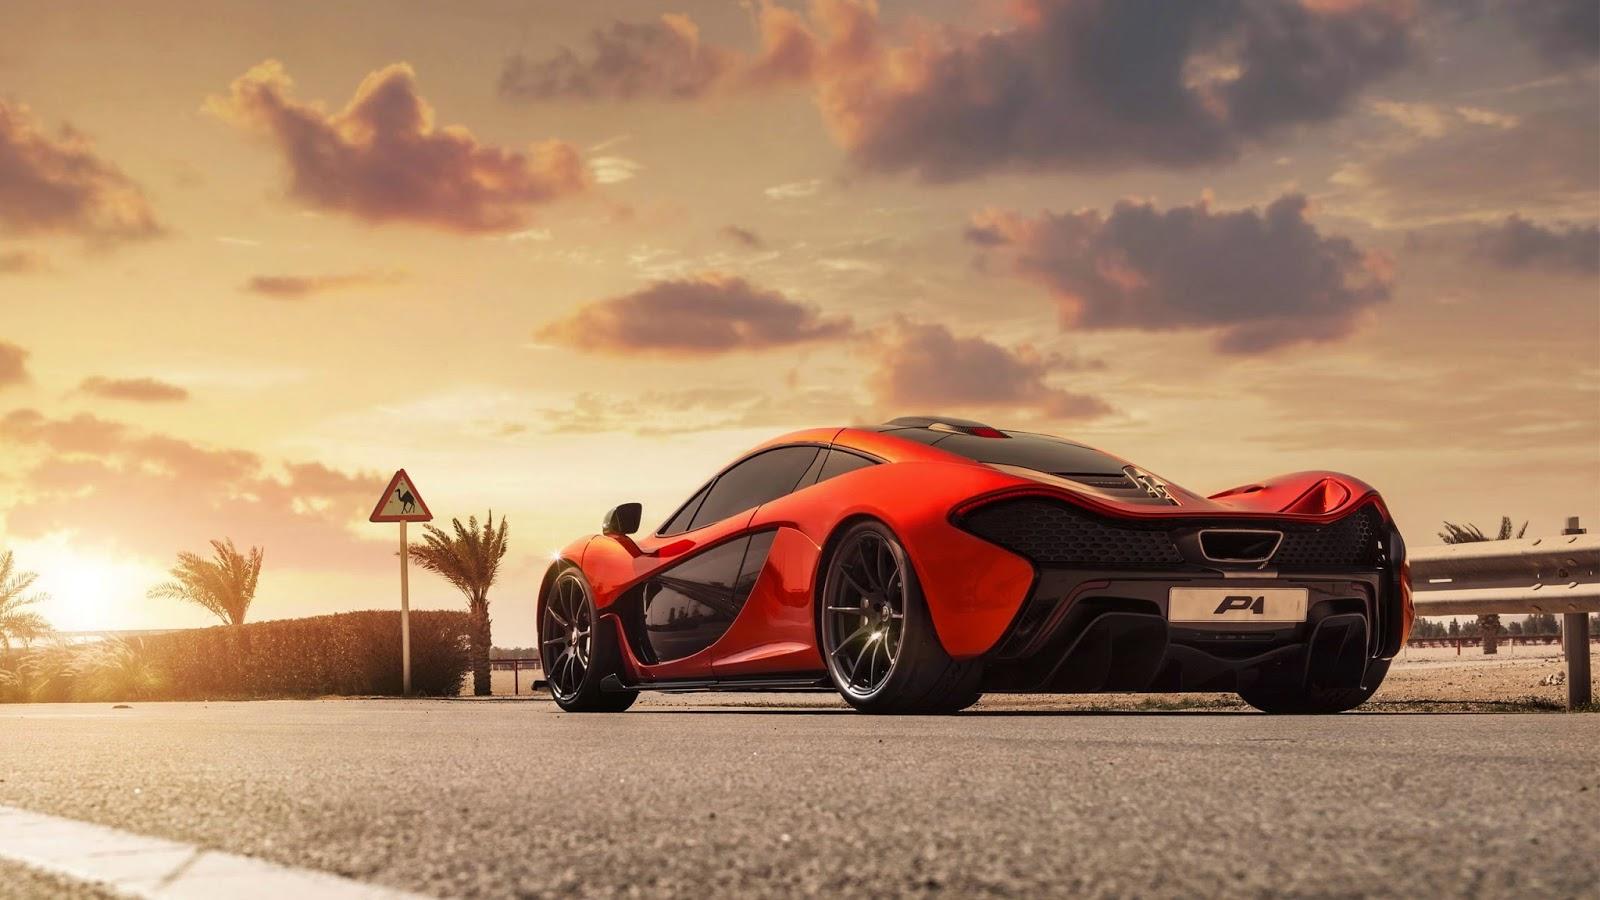 Wallpaper Mobil Sport Ferrari